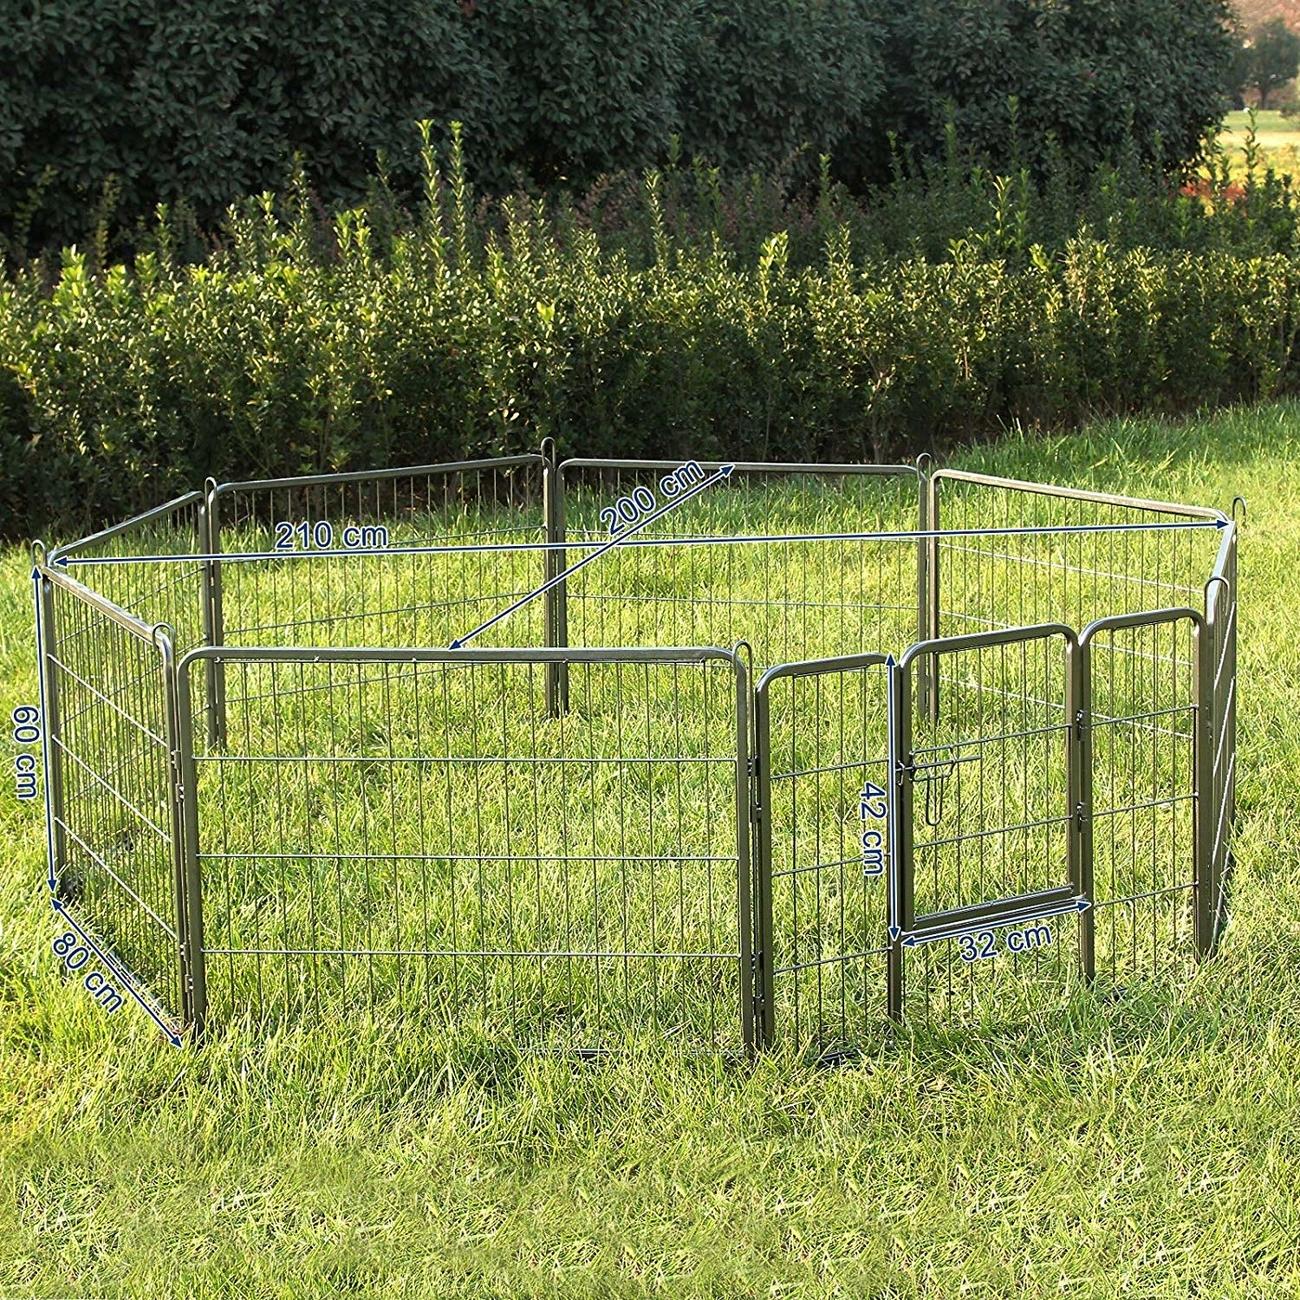 FEANDREA Welpenfreigehege Hundegehege Freilaufgehege 80x60cm, Bild 4